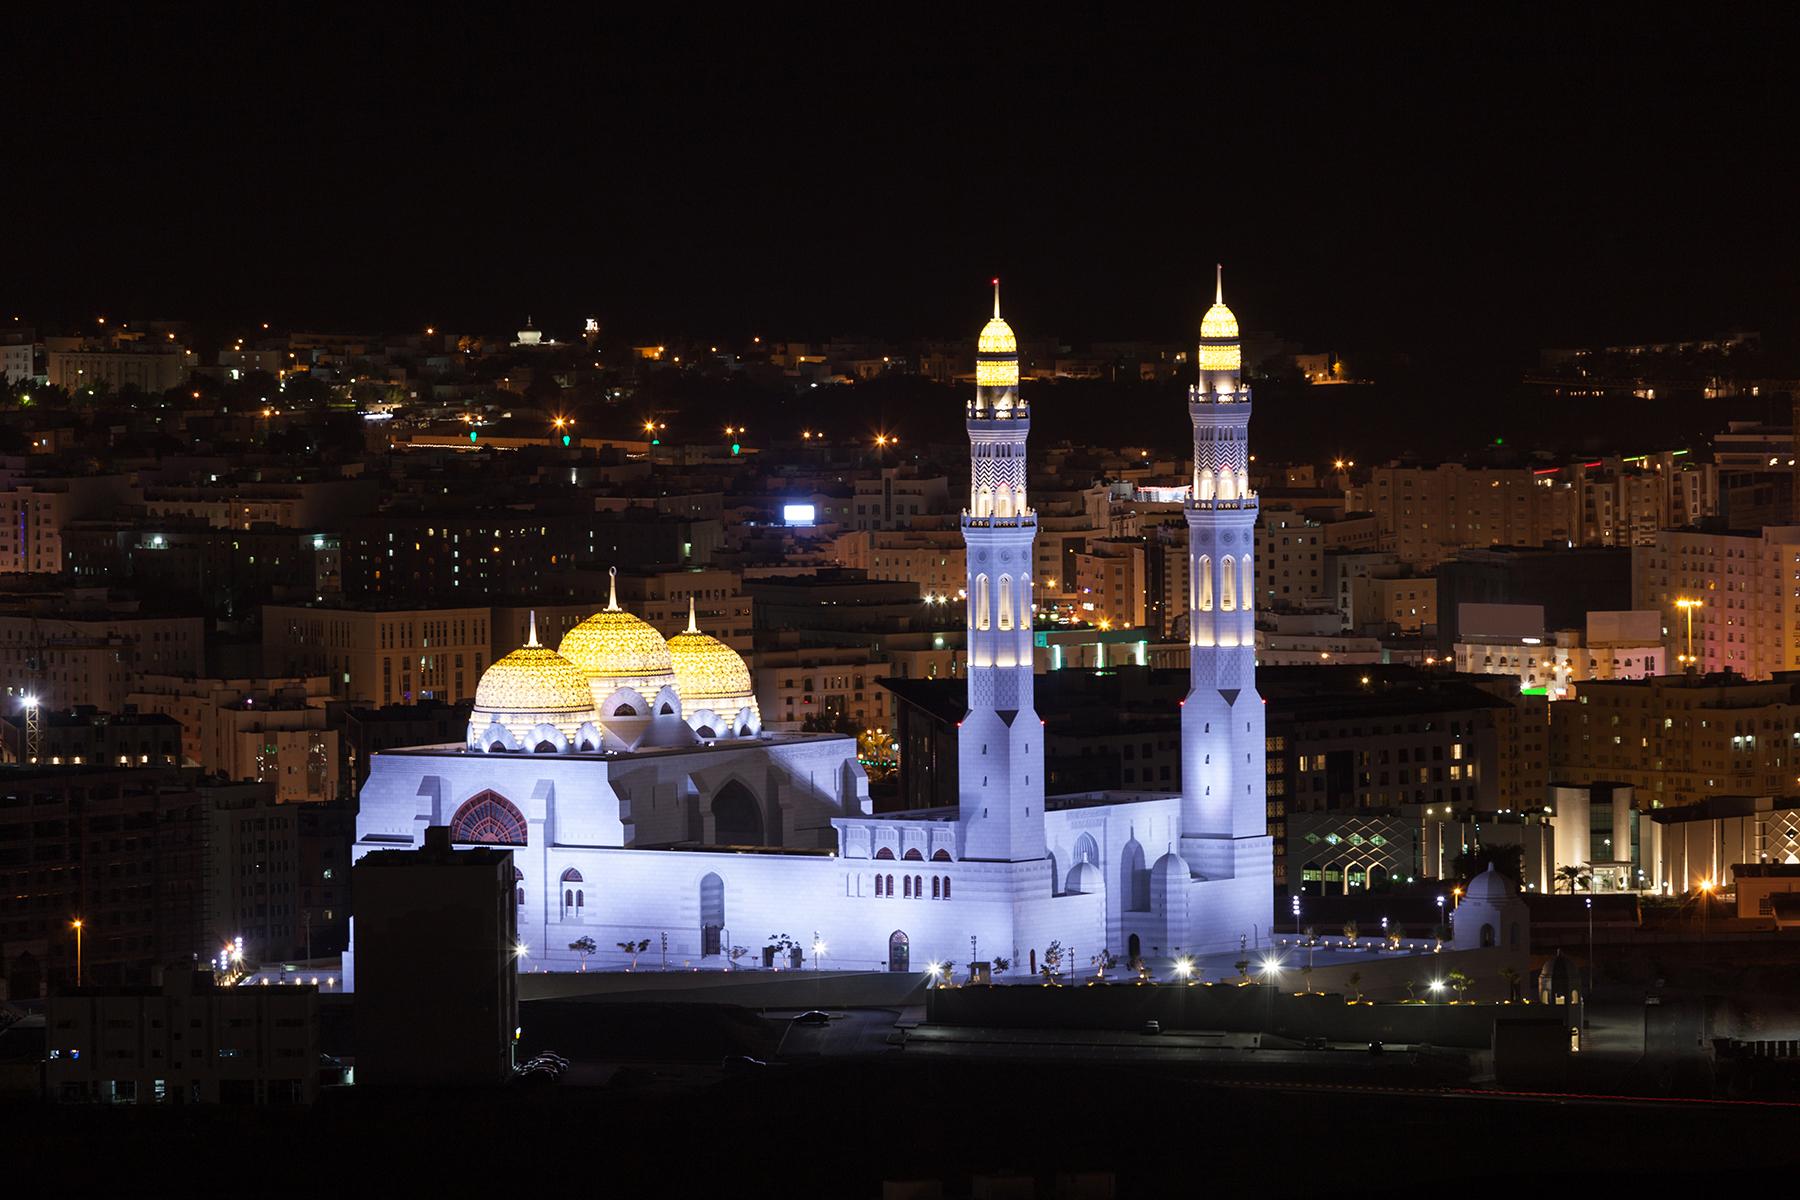 1800_oman_bigstock-Mosque-In-Muscat-Oman-116418653.jpg